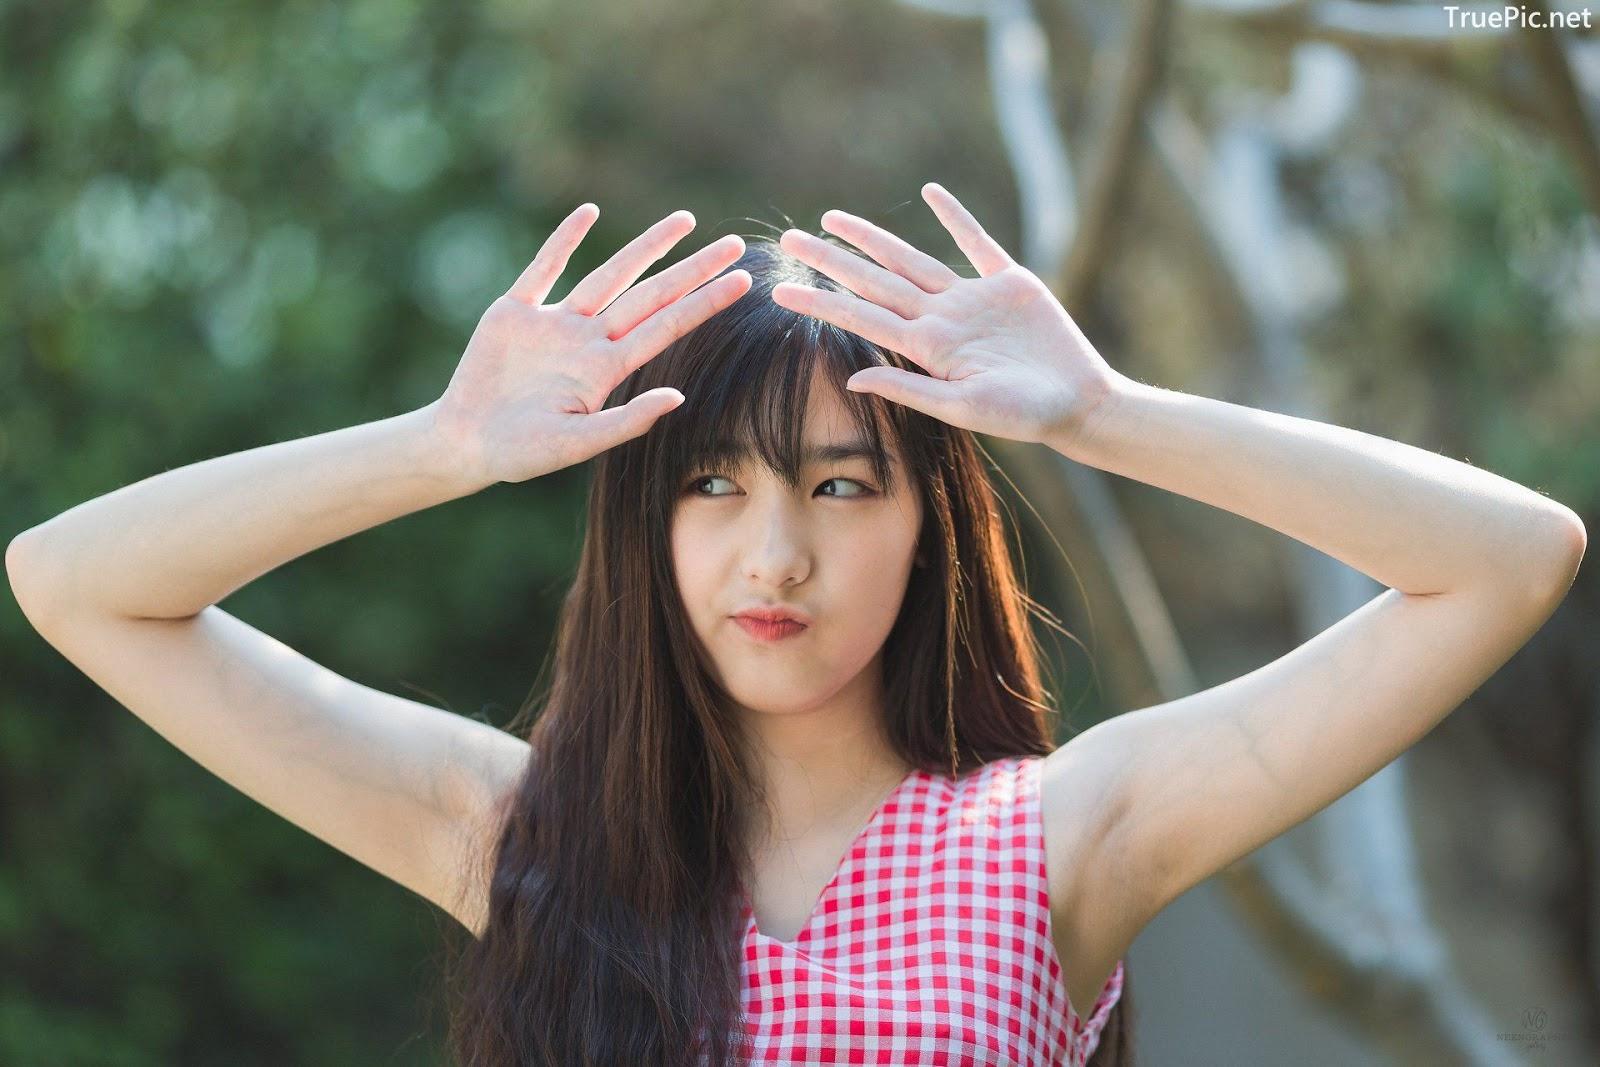 Image-Thailand-Cute-Model-Emma-Panisara–Album-Emma-Bright-Sunday-TruePic.net- Picture-11